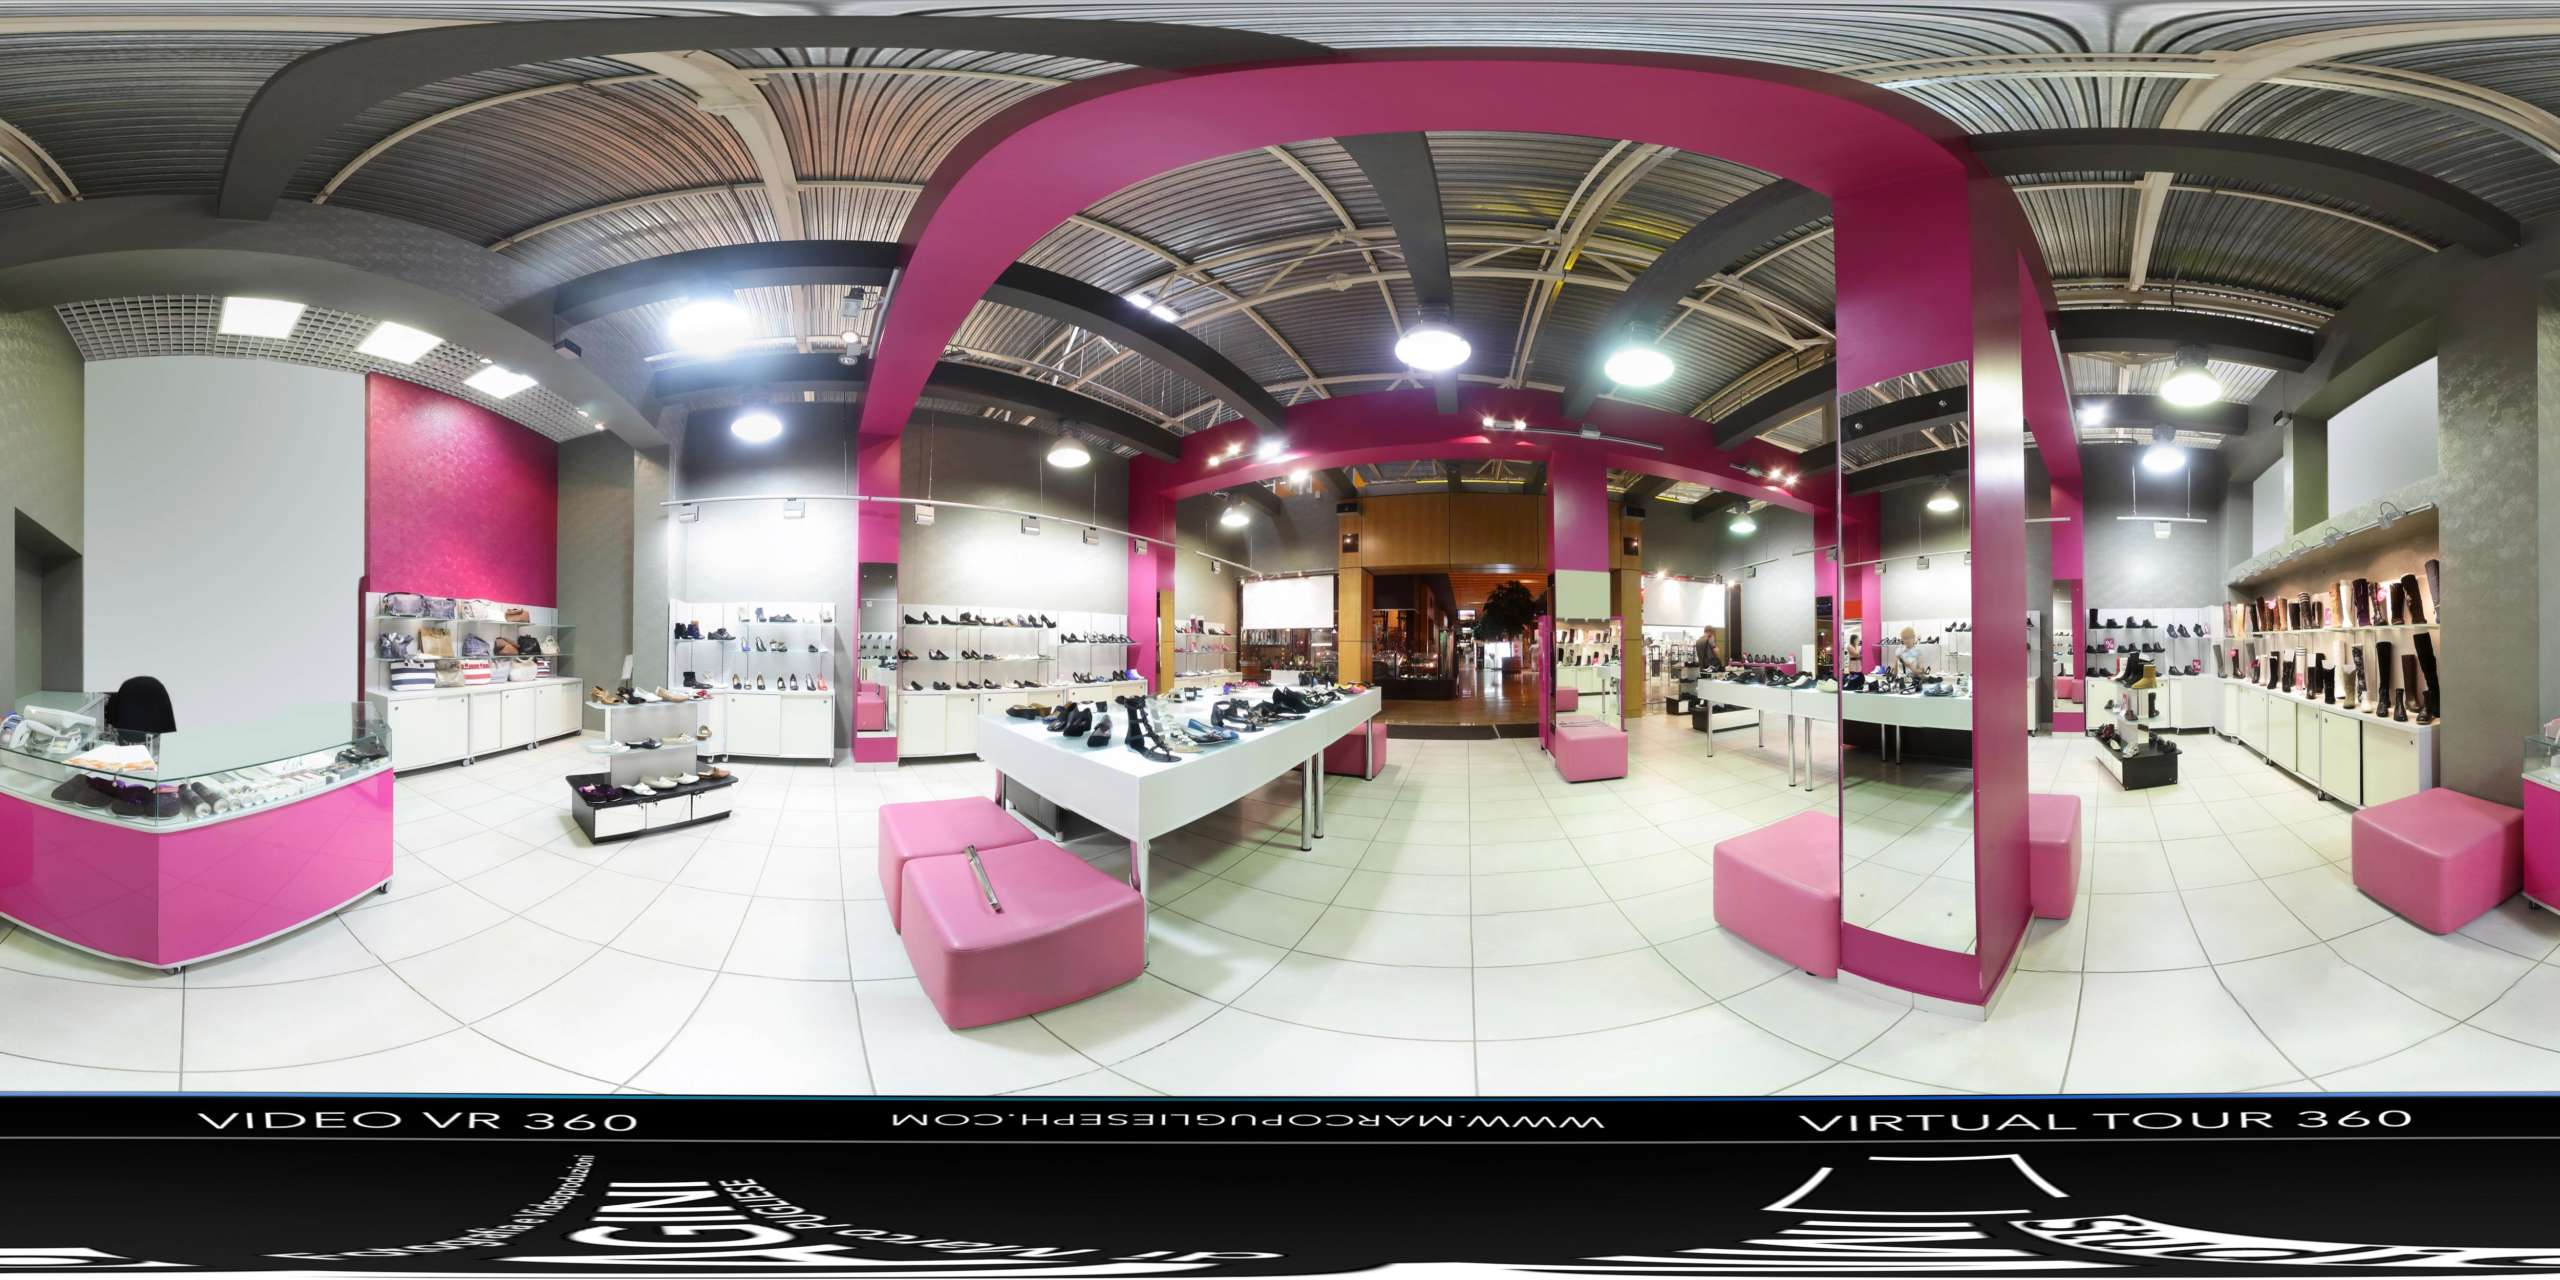 virtual tour 360 Negozio